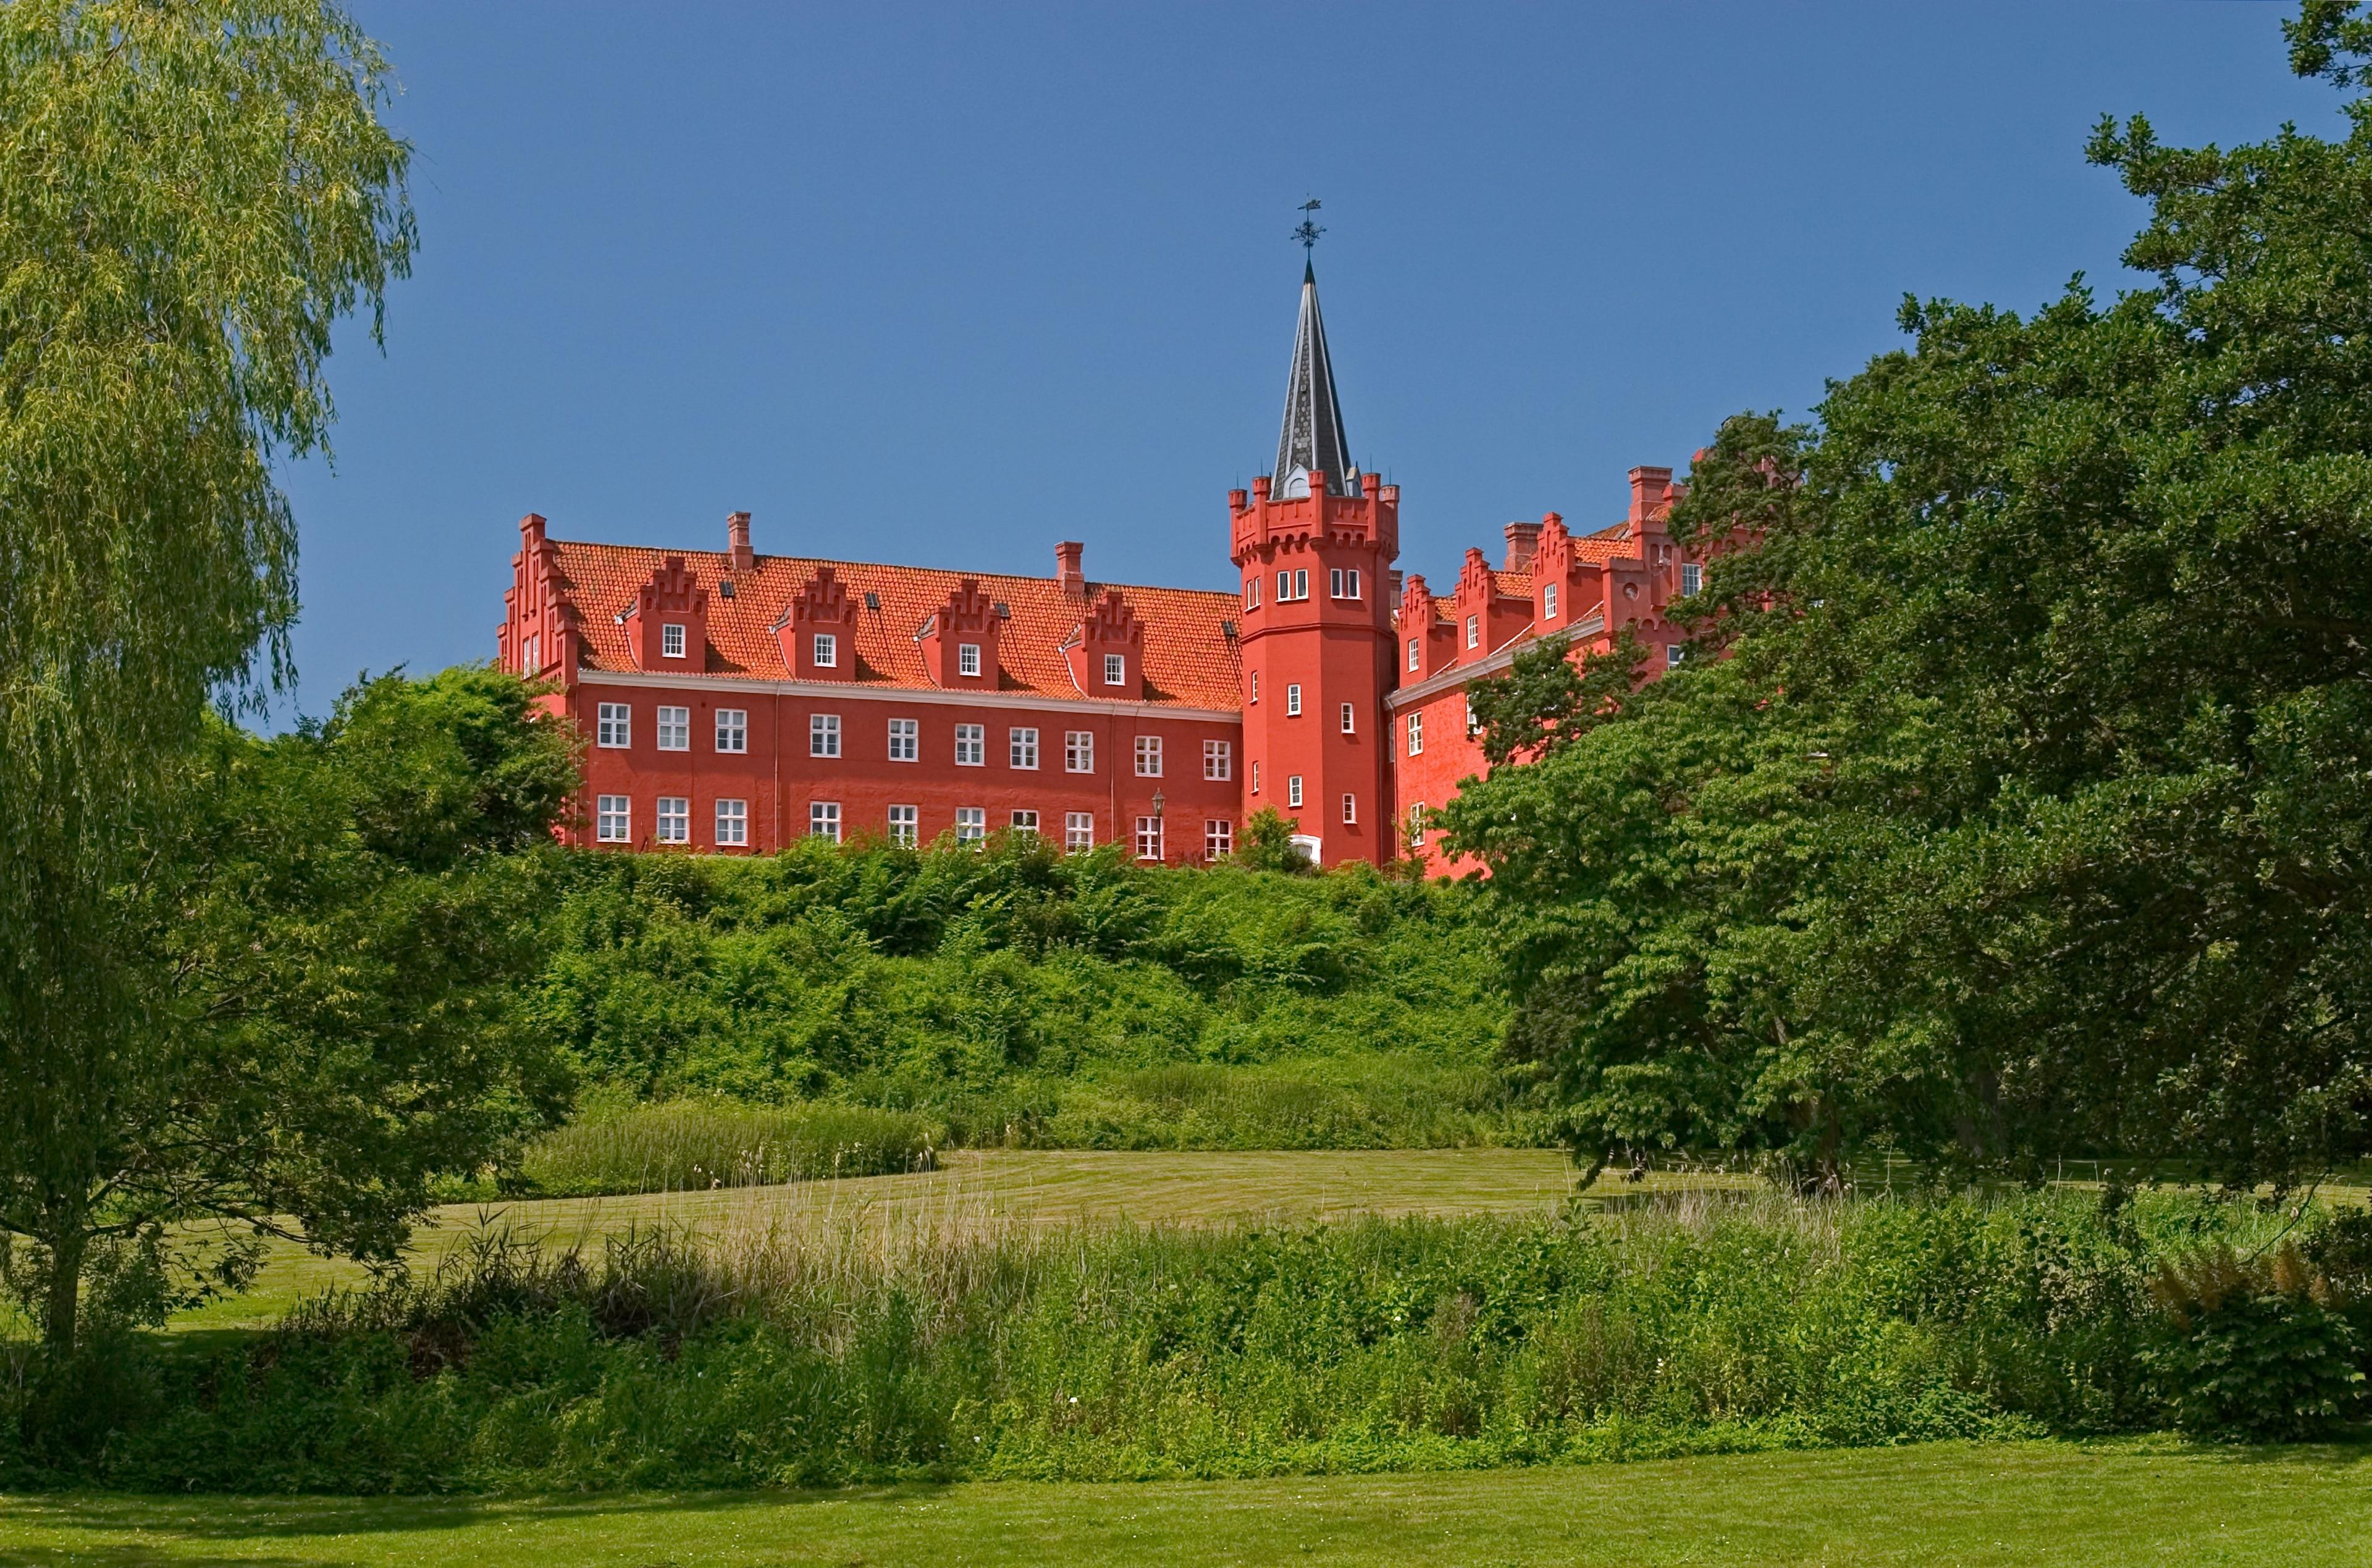 Tranekaer, Syddanmark, Denmark